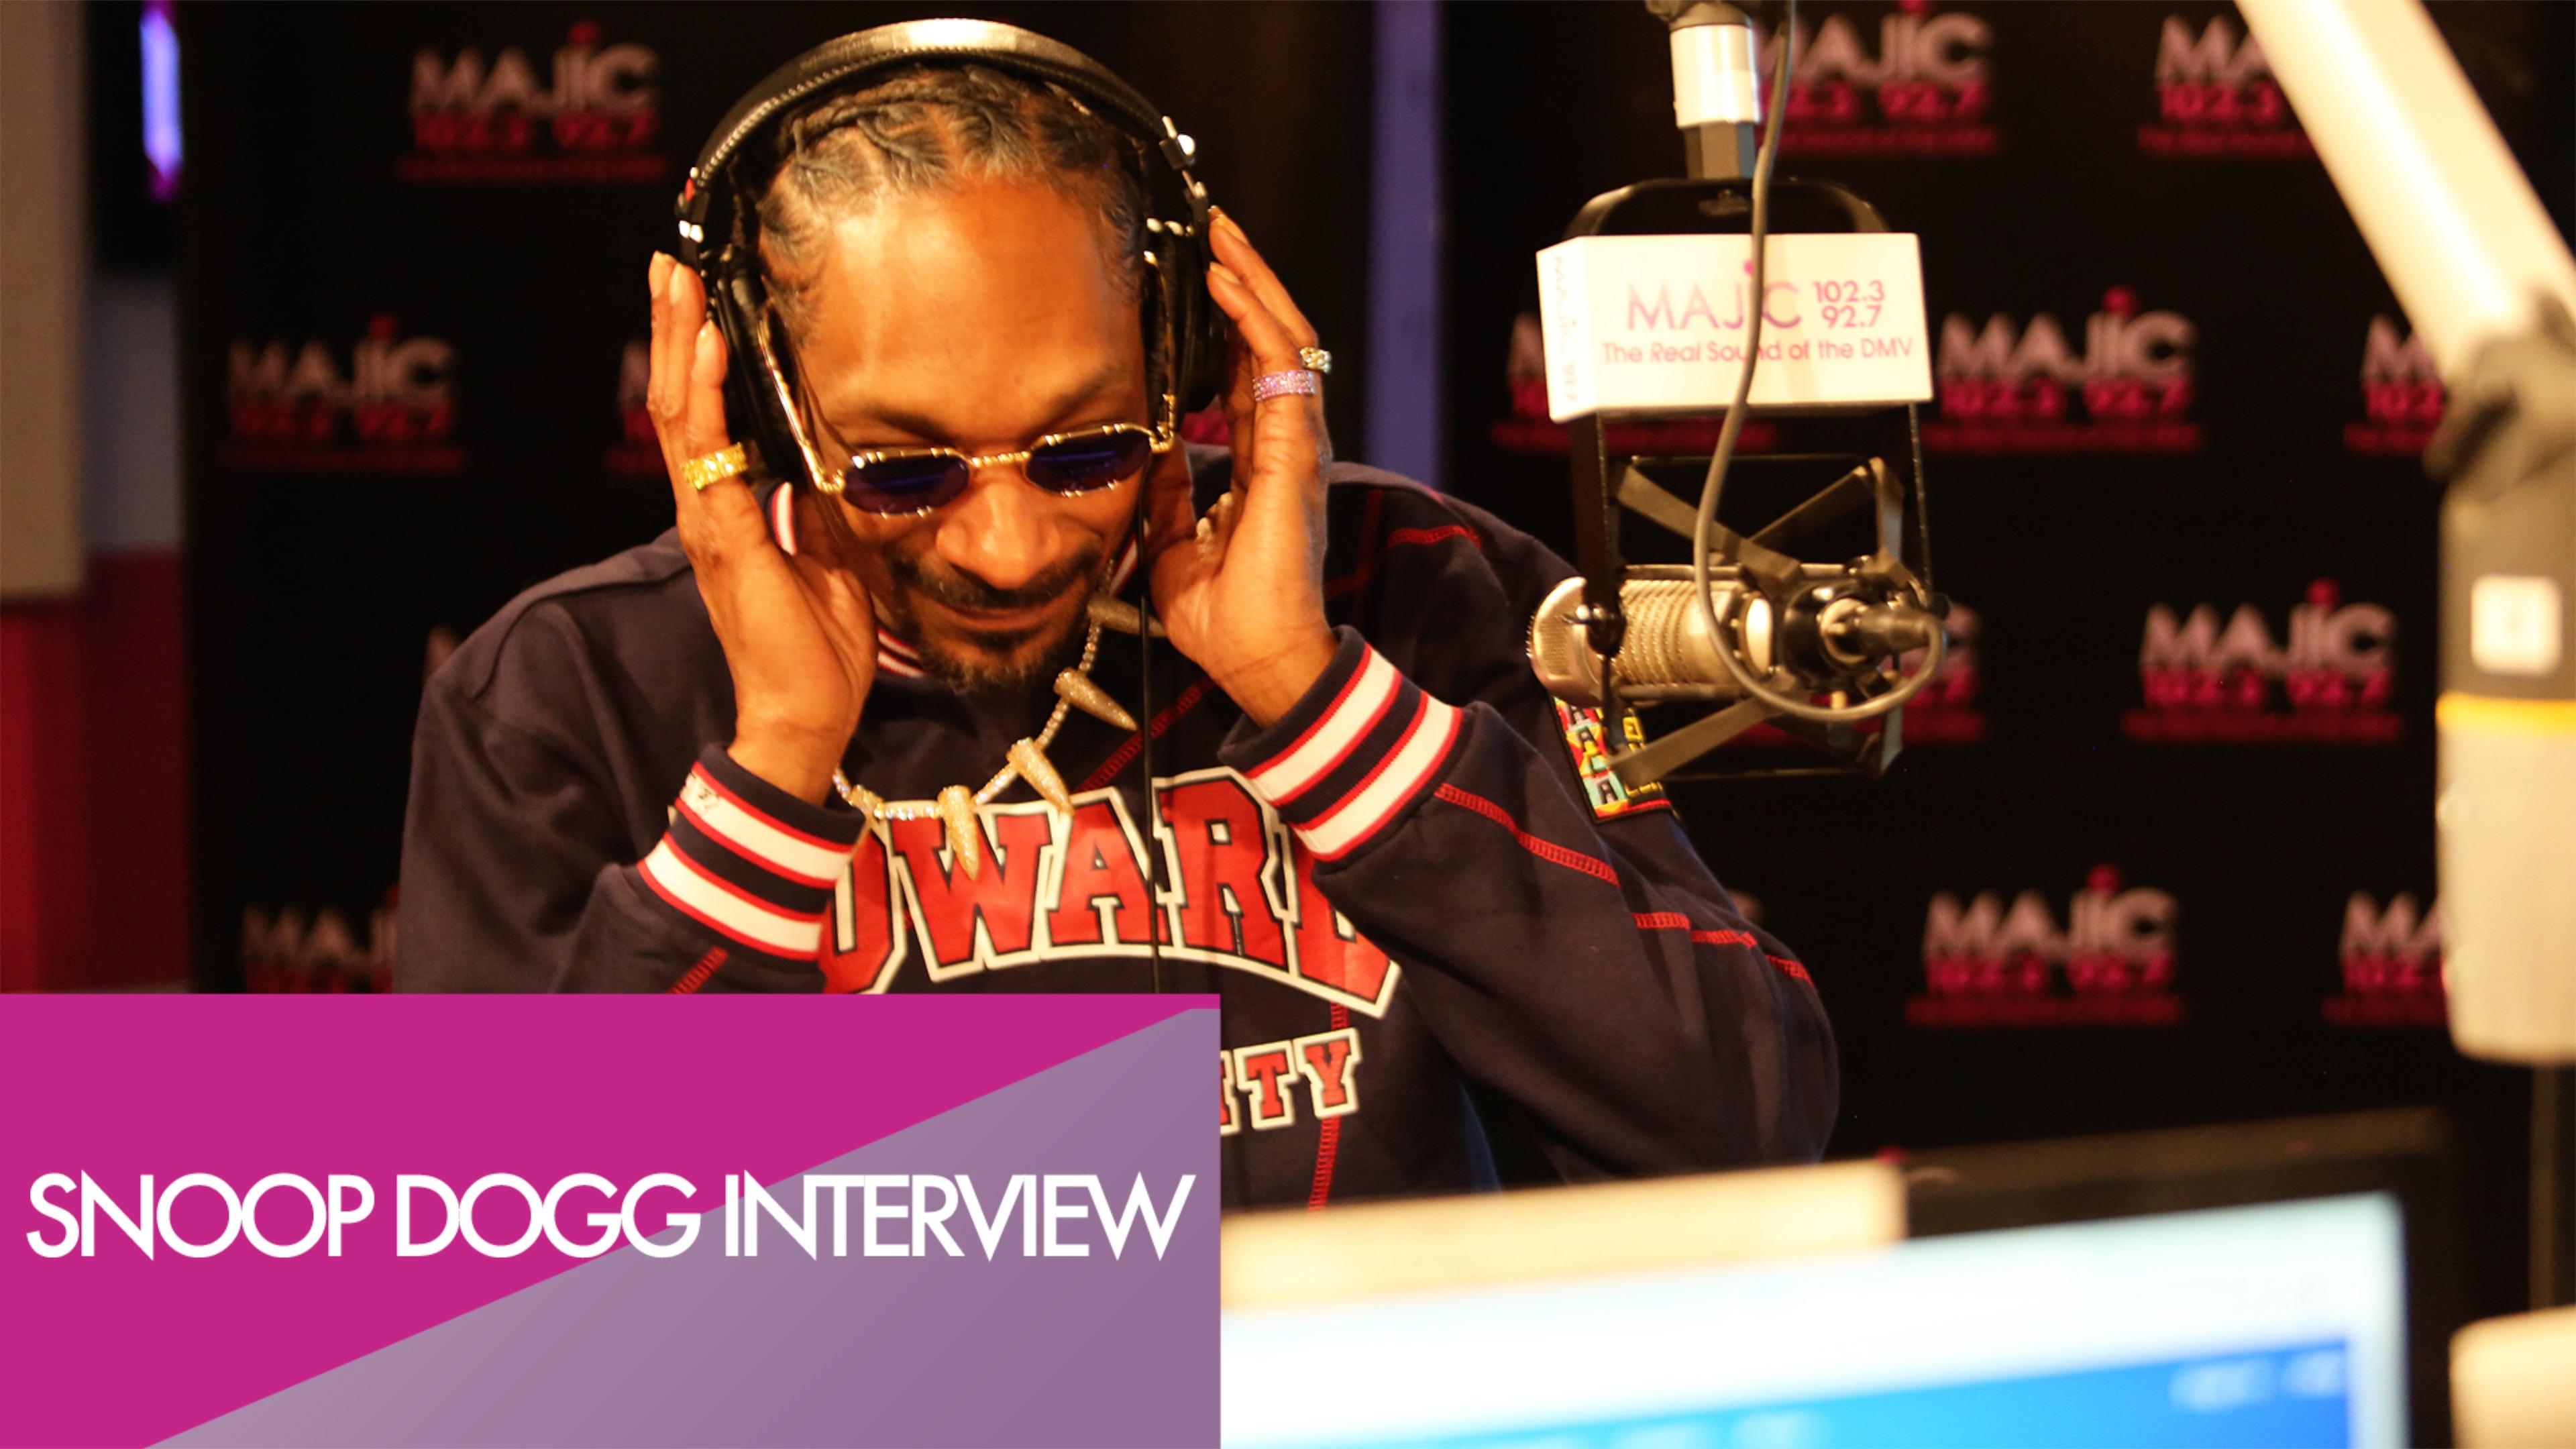 Snoop Dogg On Majic